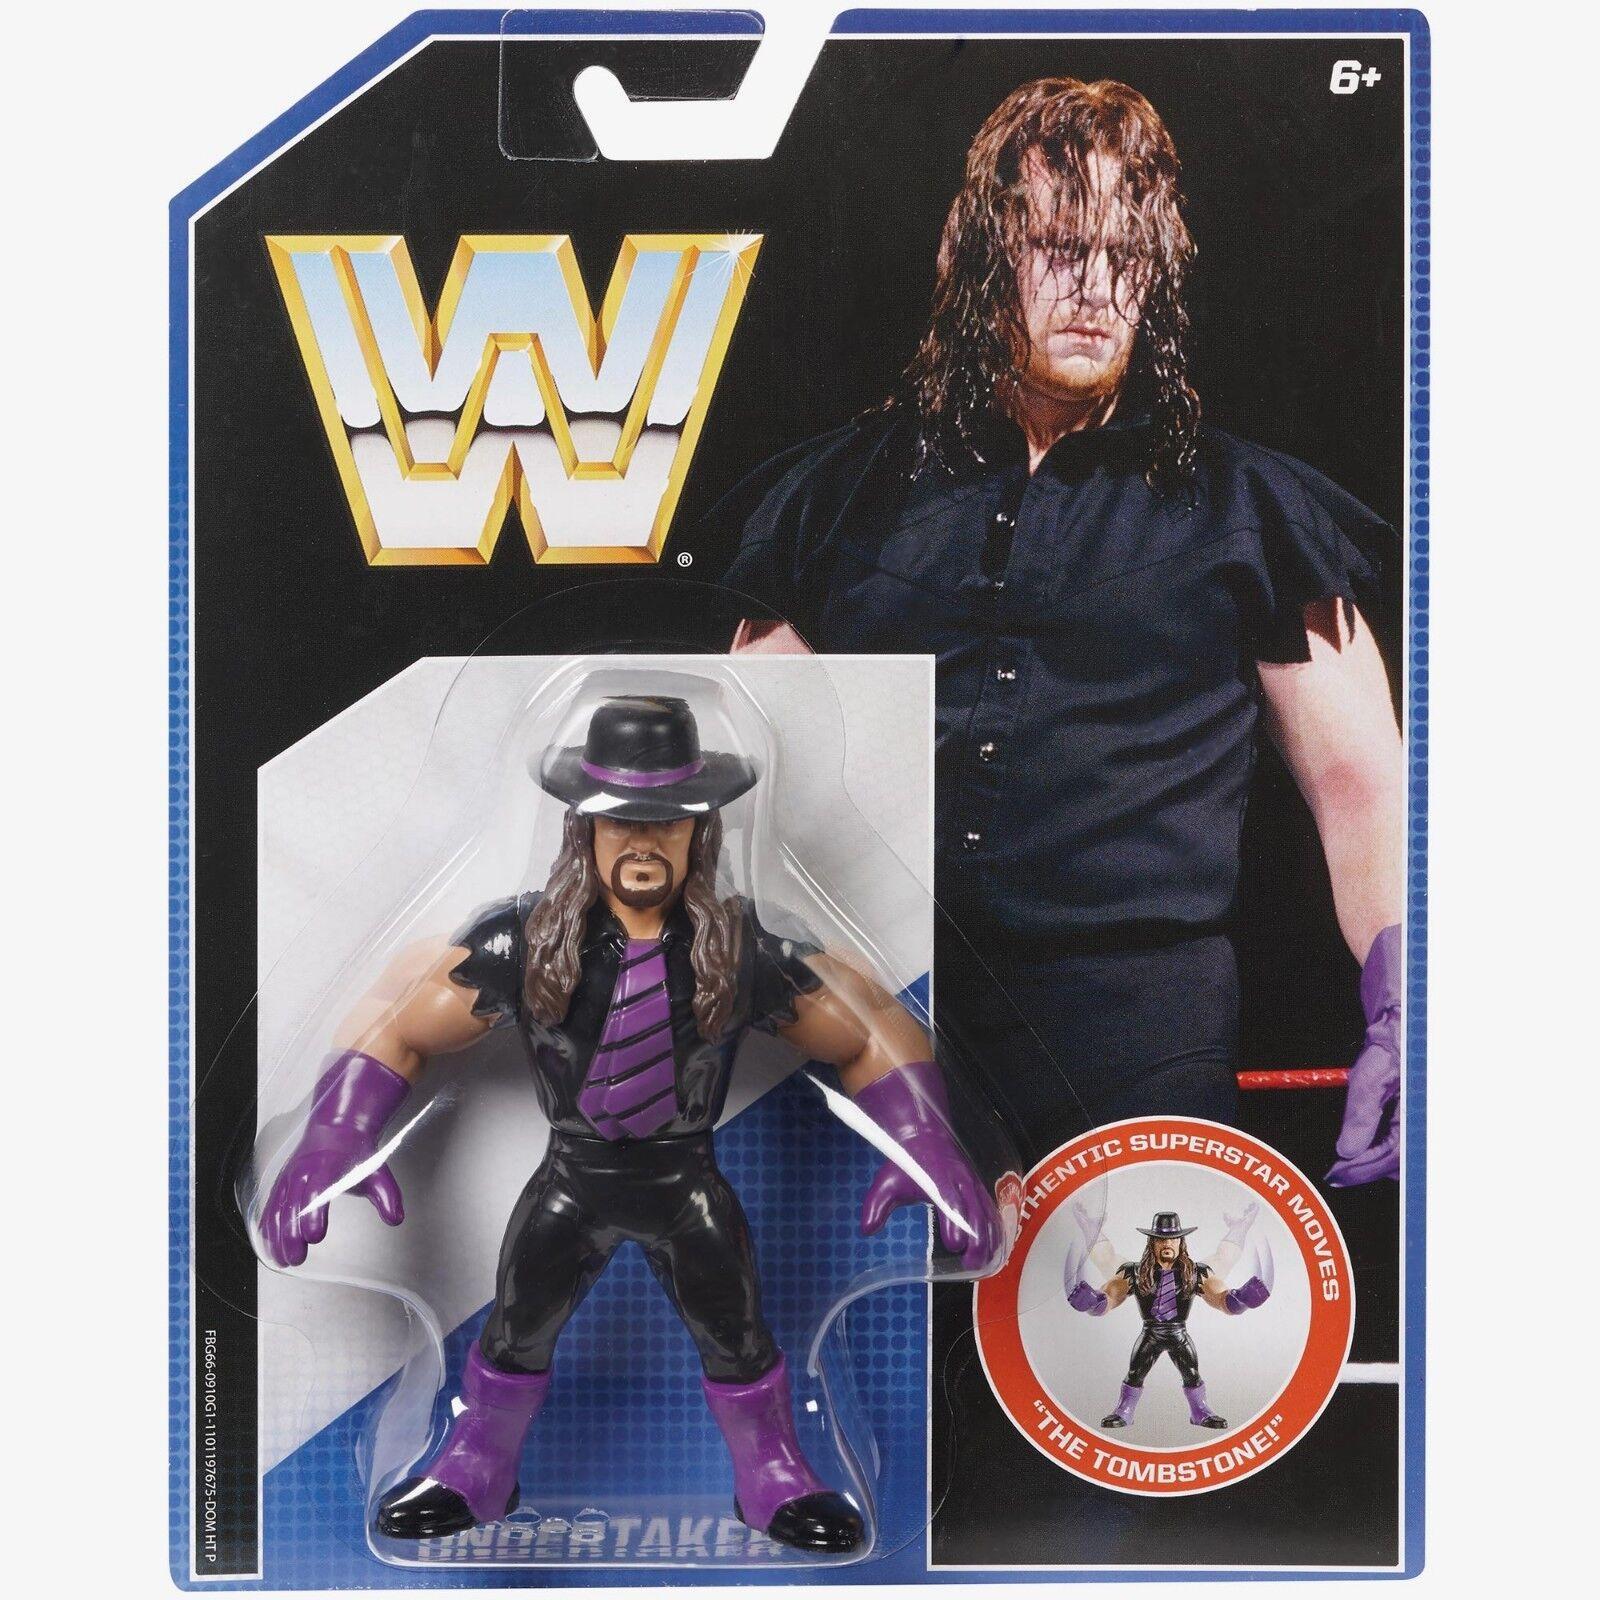 Wir retro - serie 1  Besteatter - wwf hasbro wrestling figur hulk krieger macho